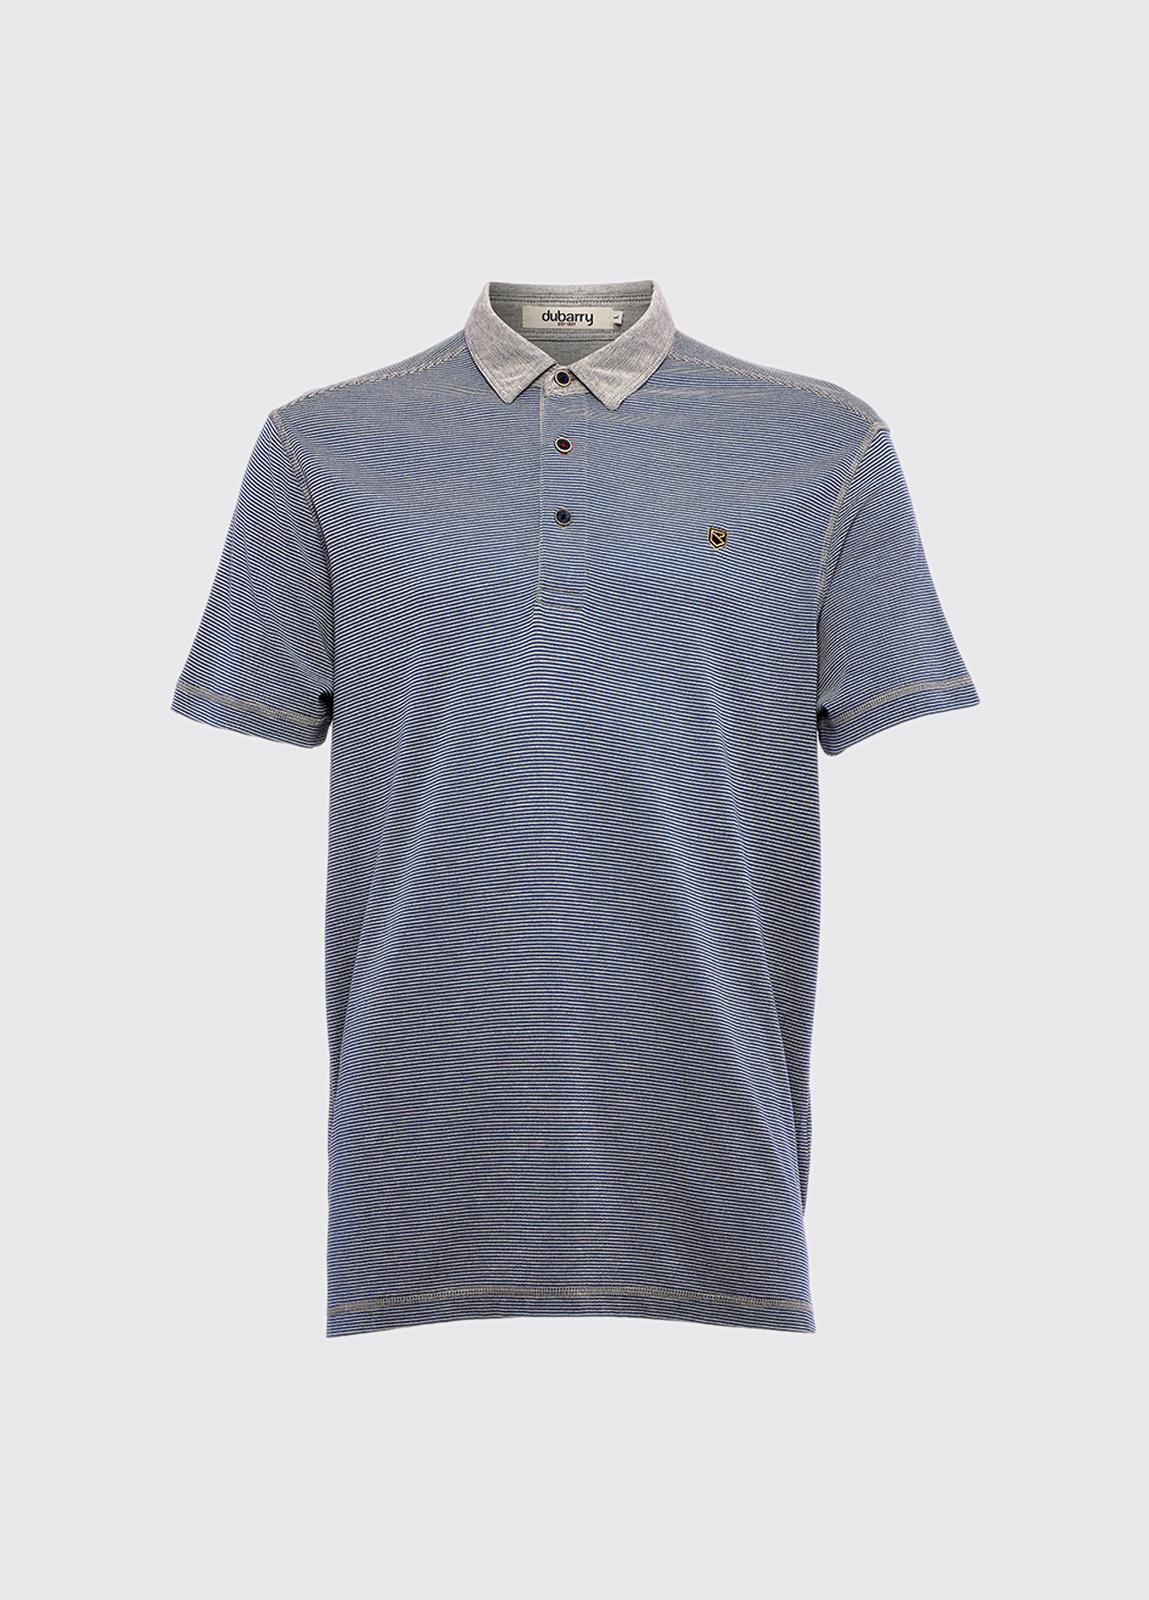 Drumcliff Polo Shirt - Navy